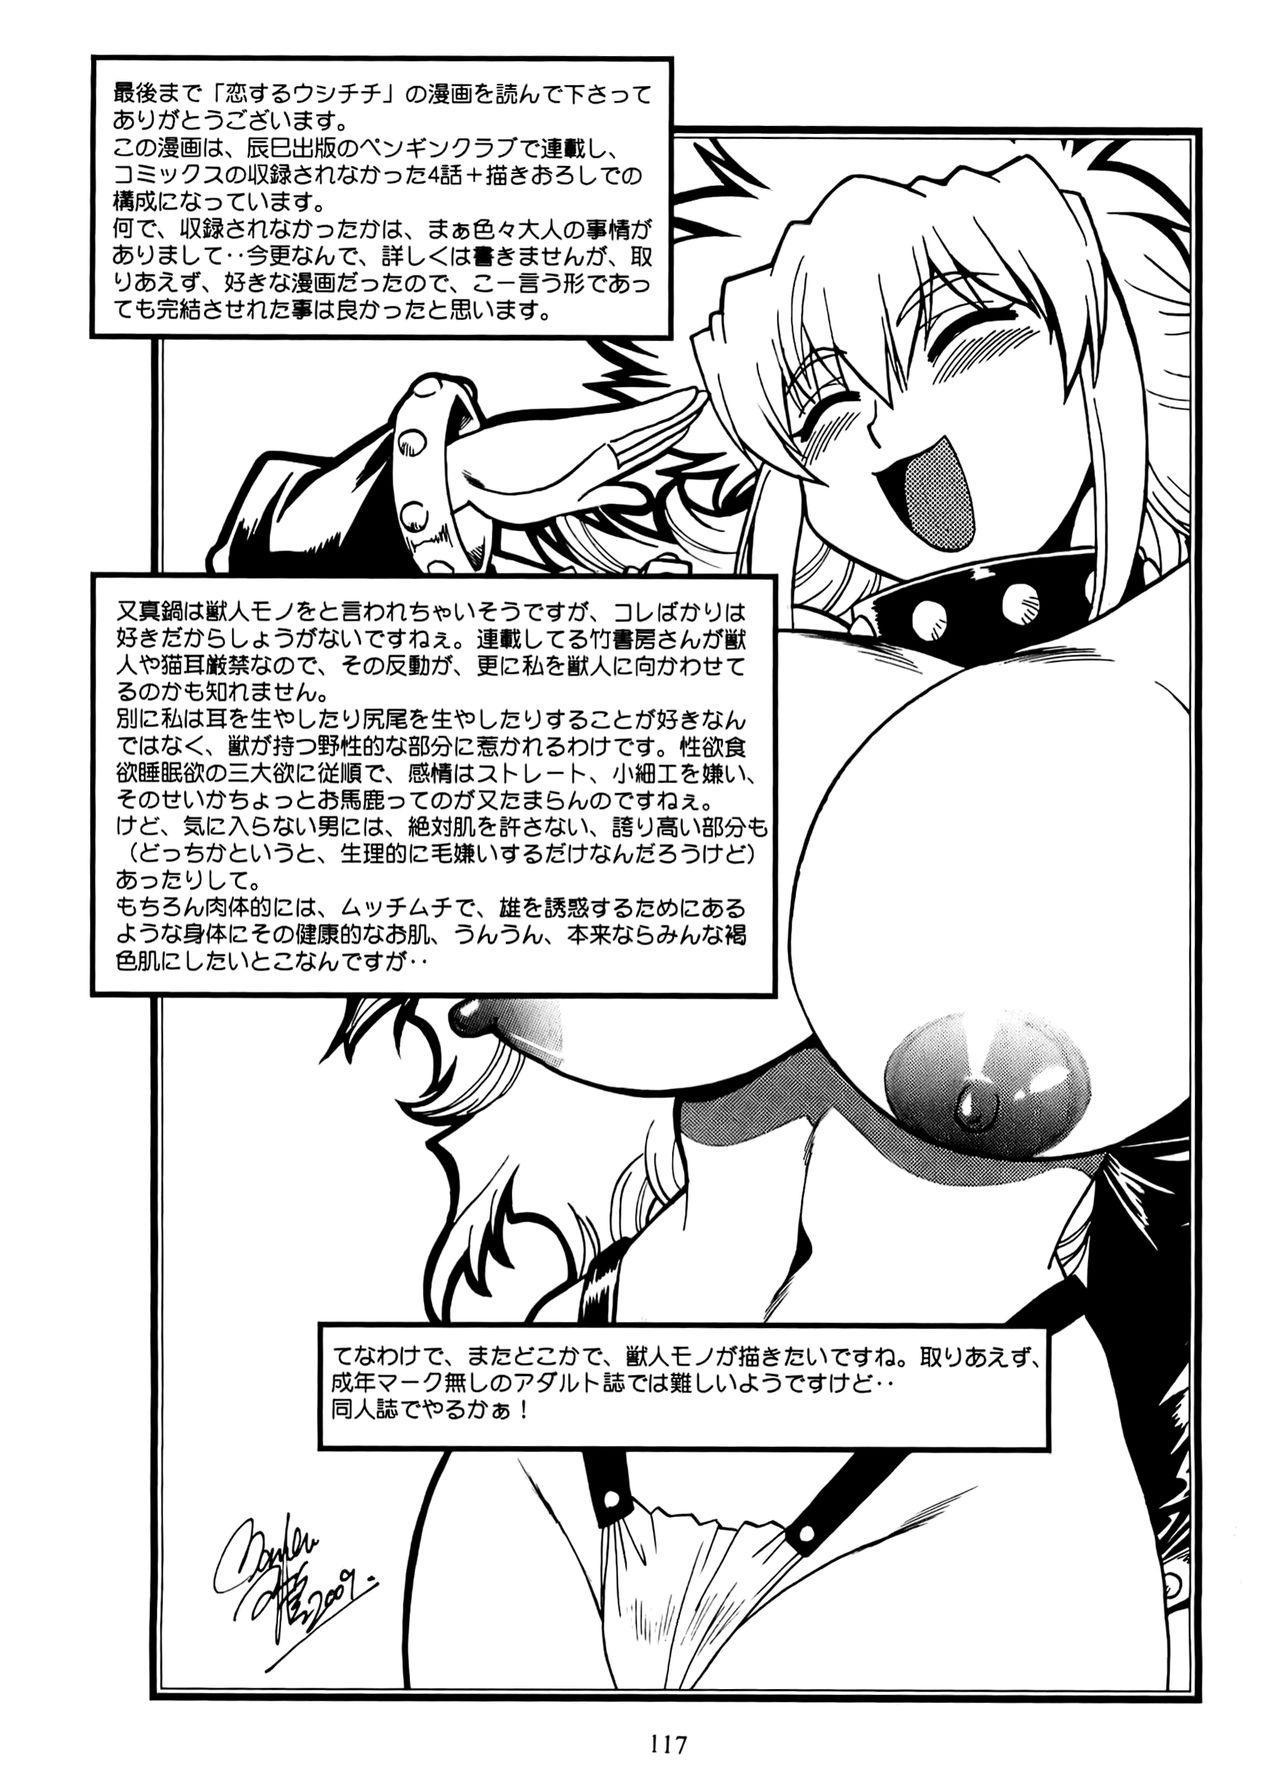 (C76) [Studio Katsudon (Manabe Jouji)] Koisuru Ushi-Chichi - Dear My Ushi-Chichi 2 [English] 115